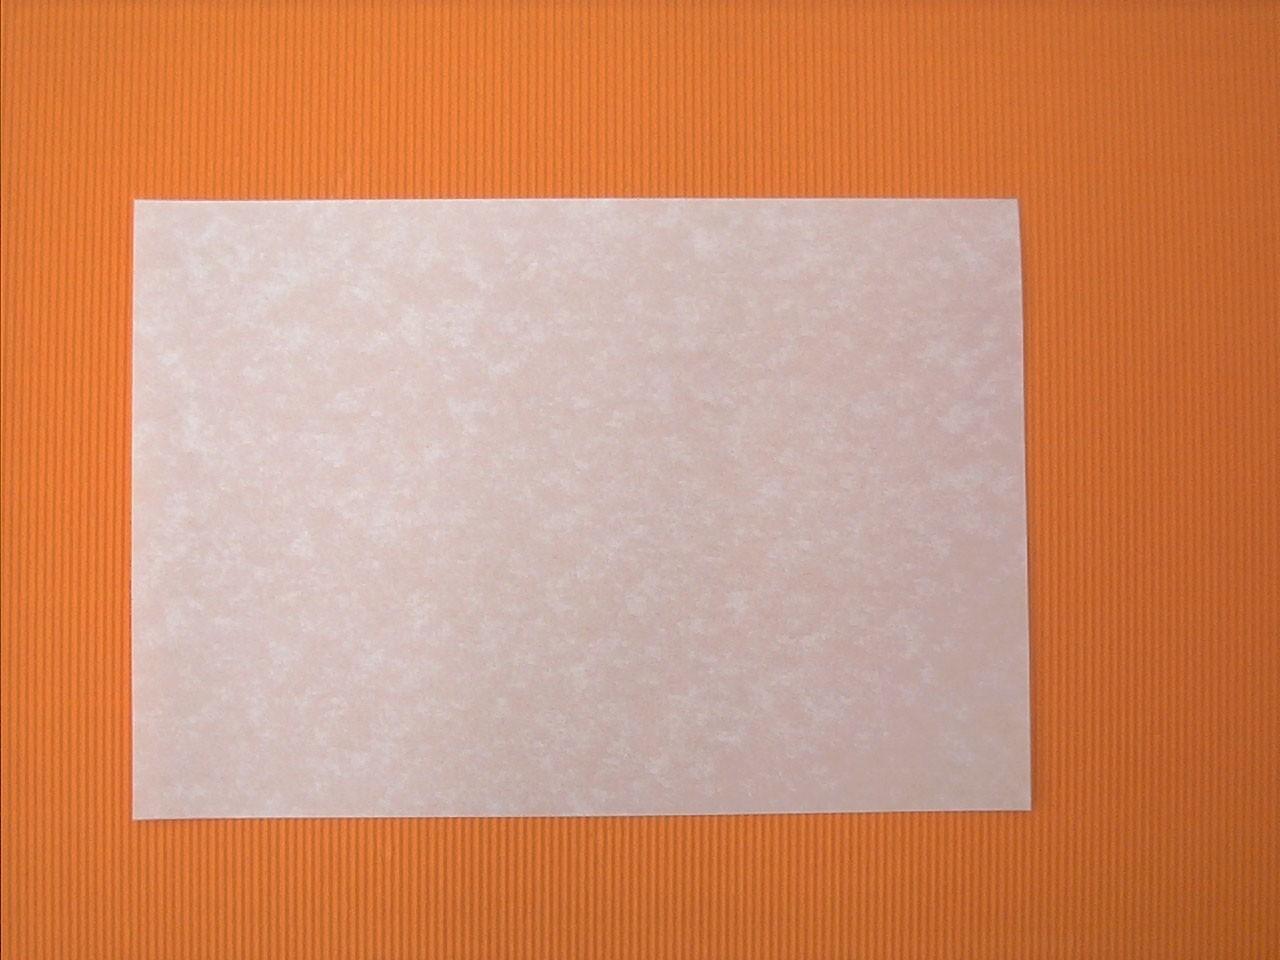 Nomex Gewebefolie, 0,18 mm, Zuschnitt 200 x 300 mm